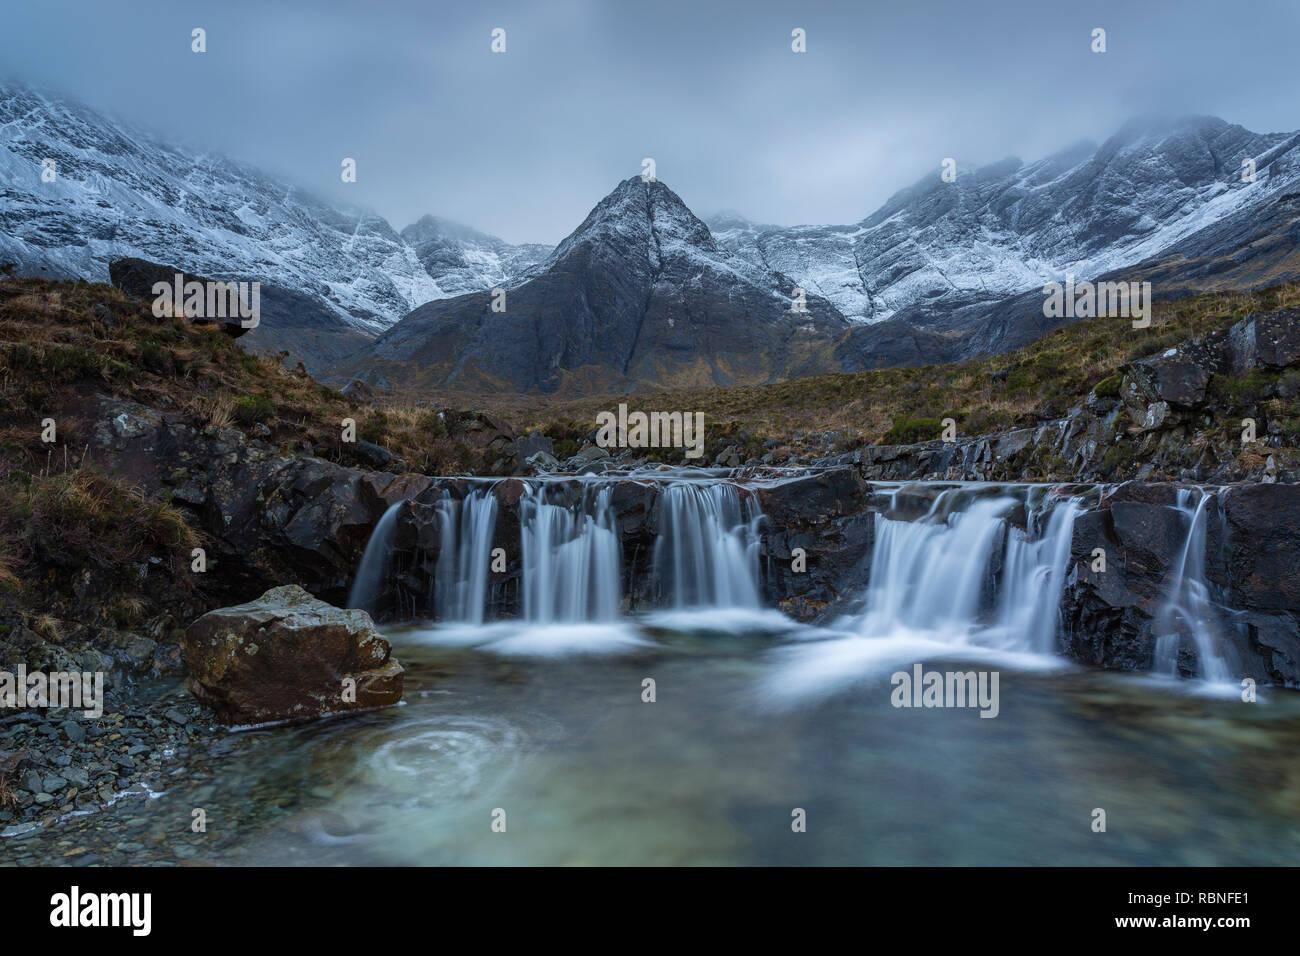 Sgurr an Fheadain and the Black Cuillin from the Fairy Pools, Glen Brittle, Isle of Skye, Scotland - Stock Image